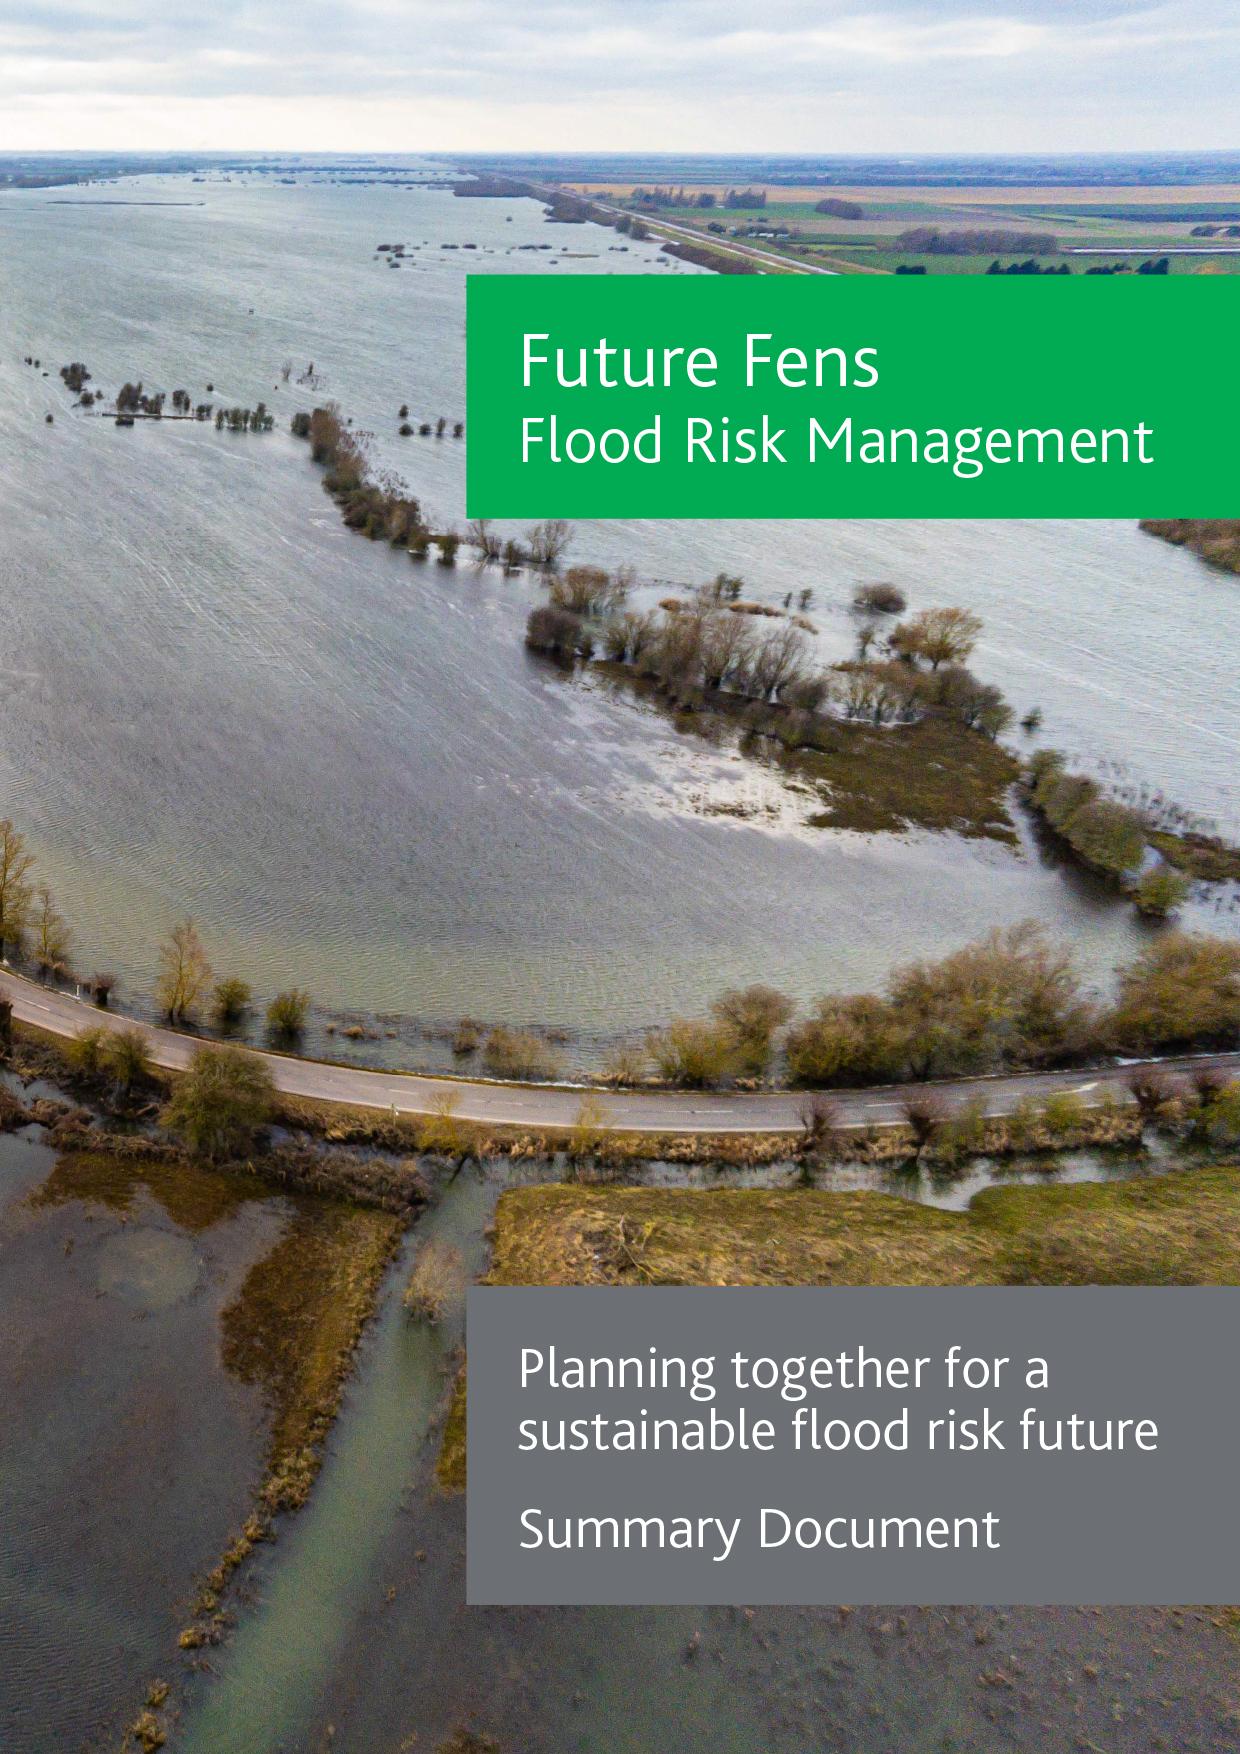 Future Fens Summary Document